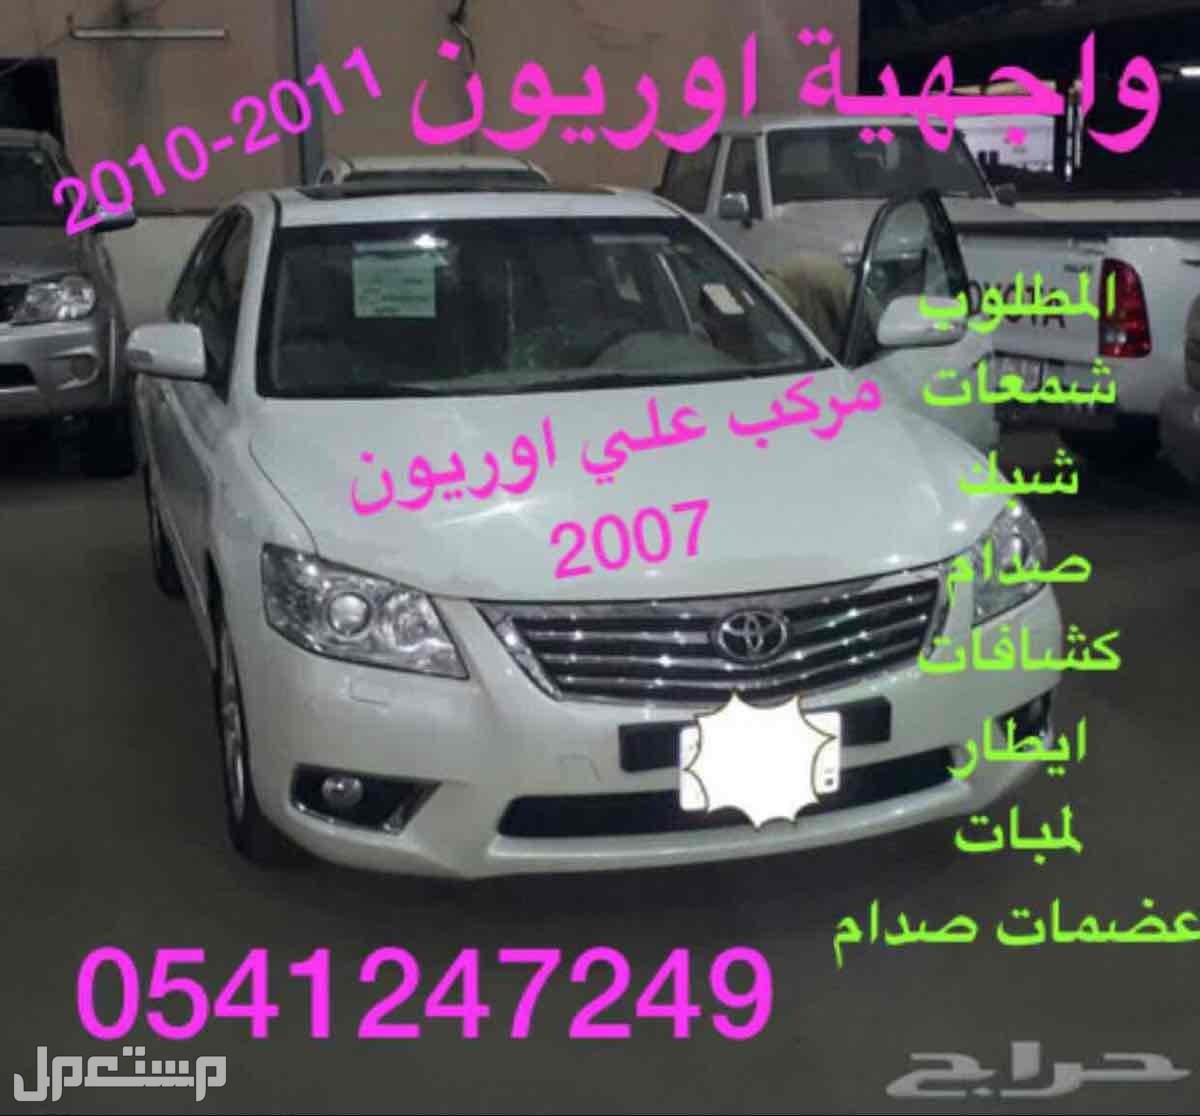 شمعات صدامات رفرف كبوت بطانه ( اوريون 2007-2008-2009 ) يوجدً شحن